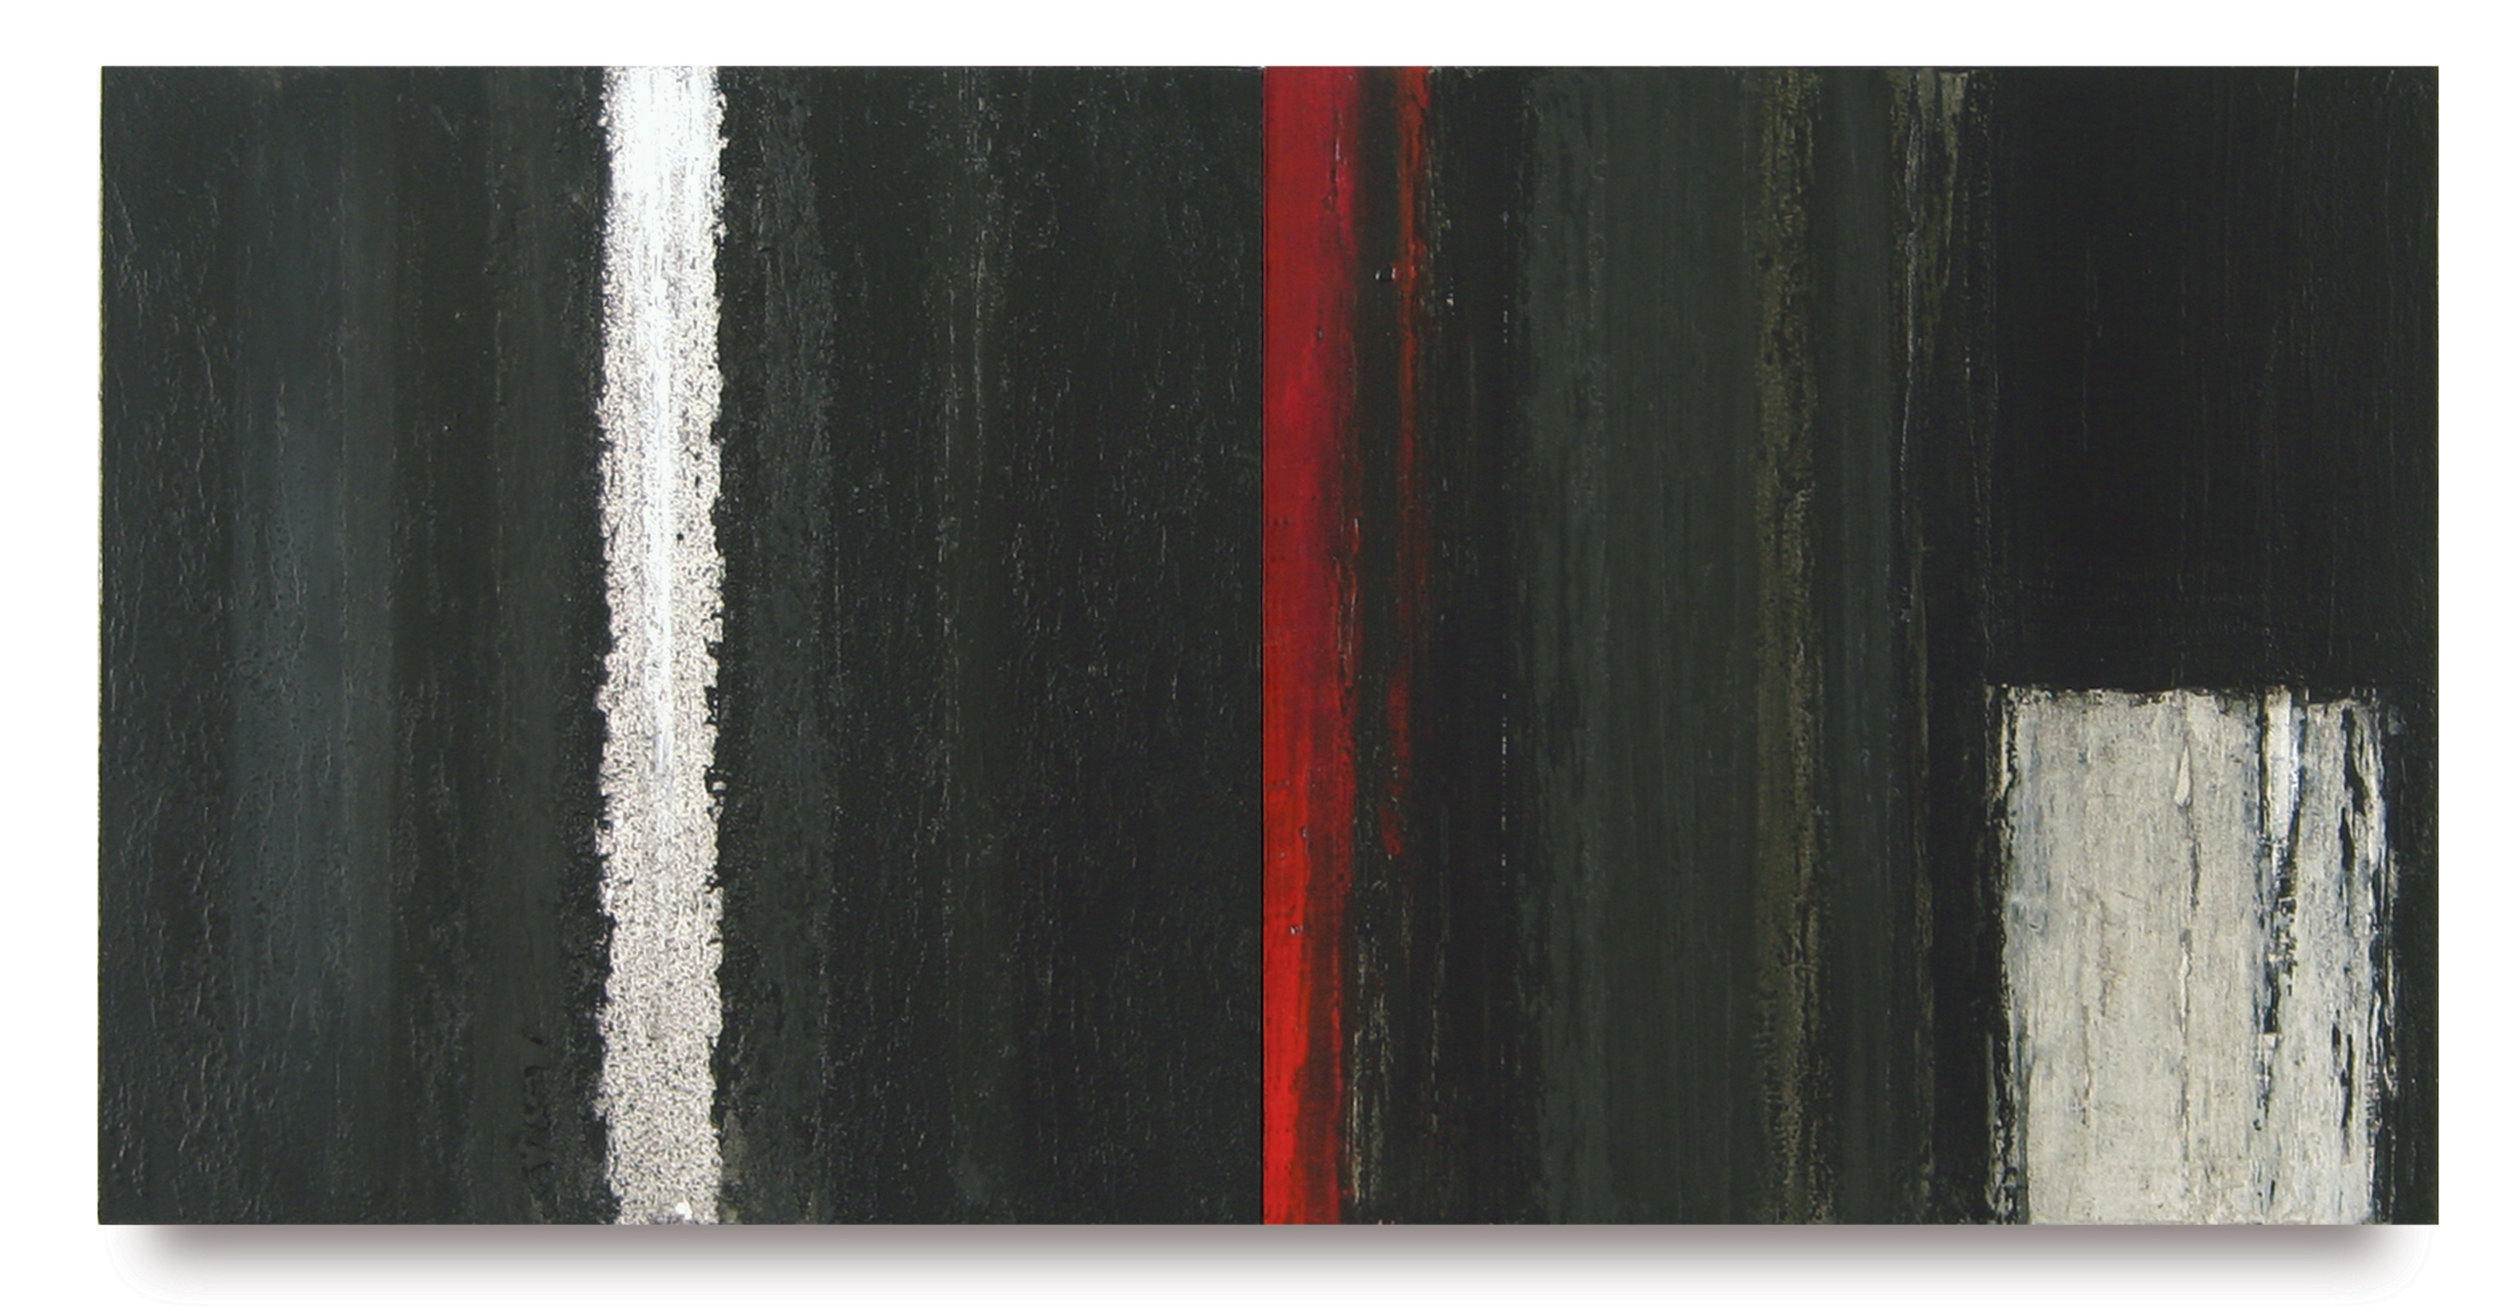 Unconstructed Short, 2012